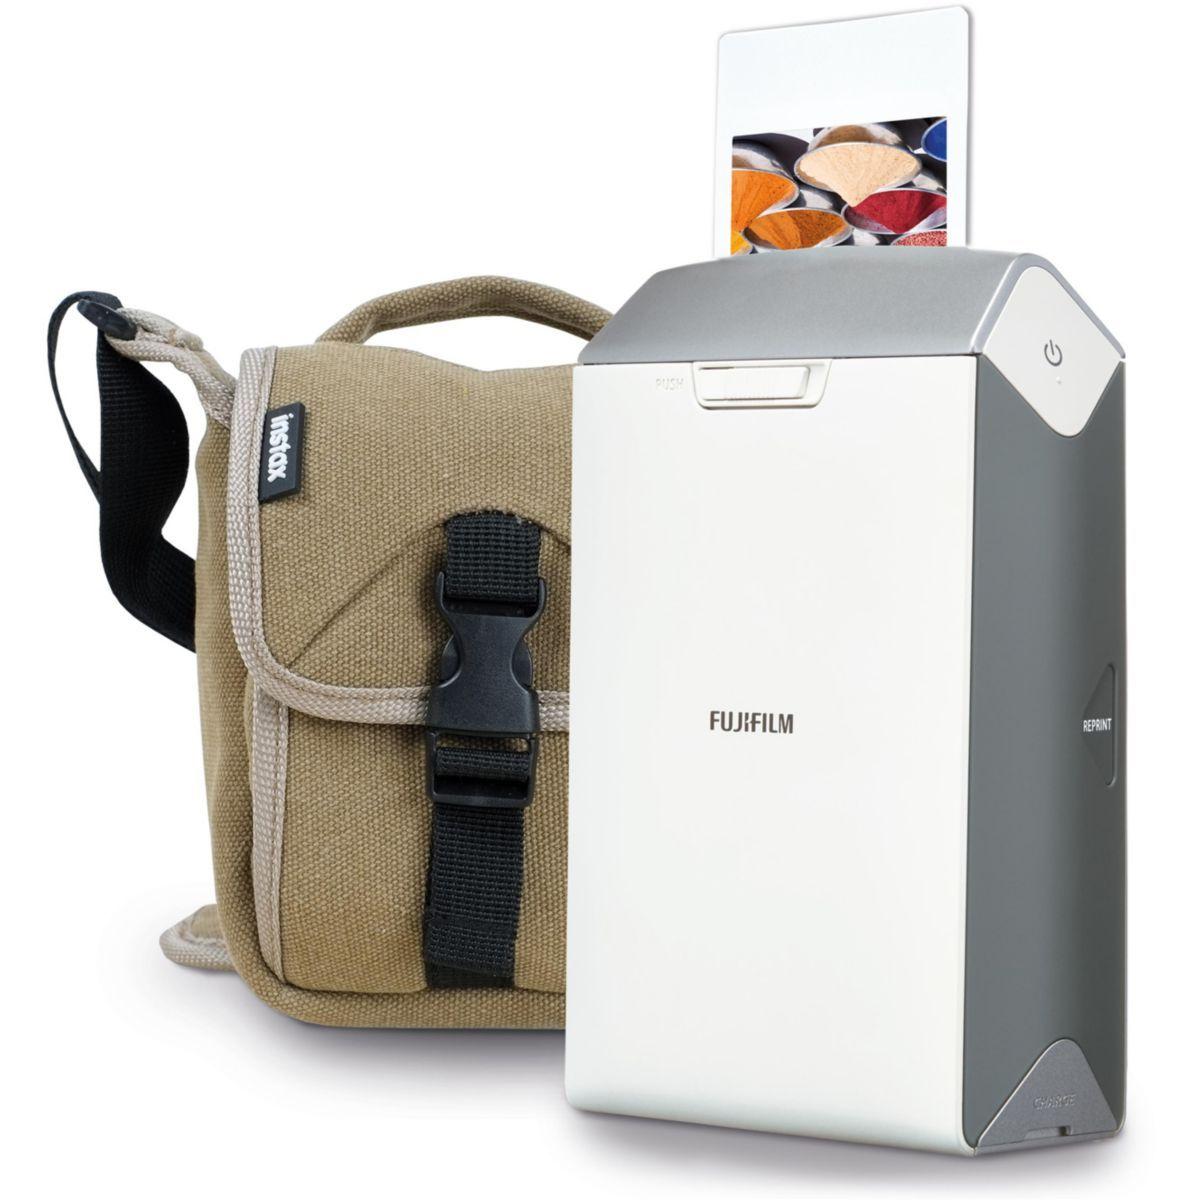 Imprimante Smartphone Fujifilm Instax Share SP-2 Wi-Fi, Argent